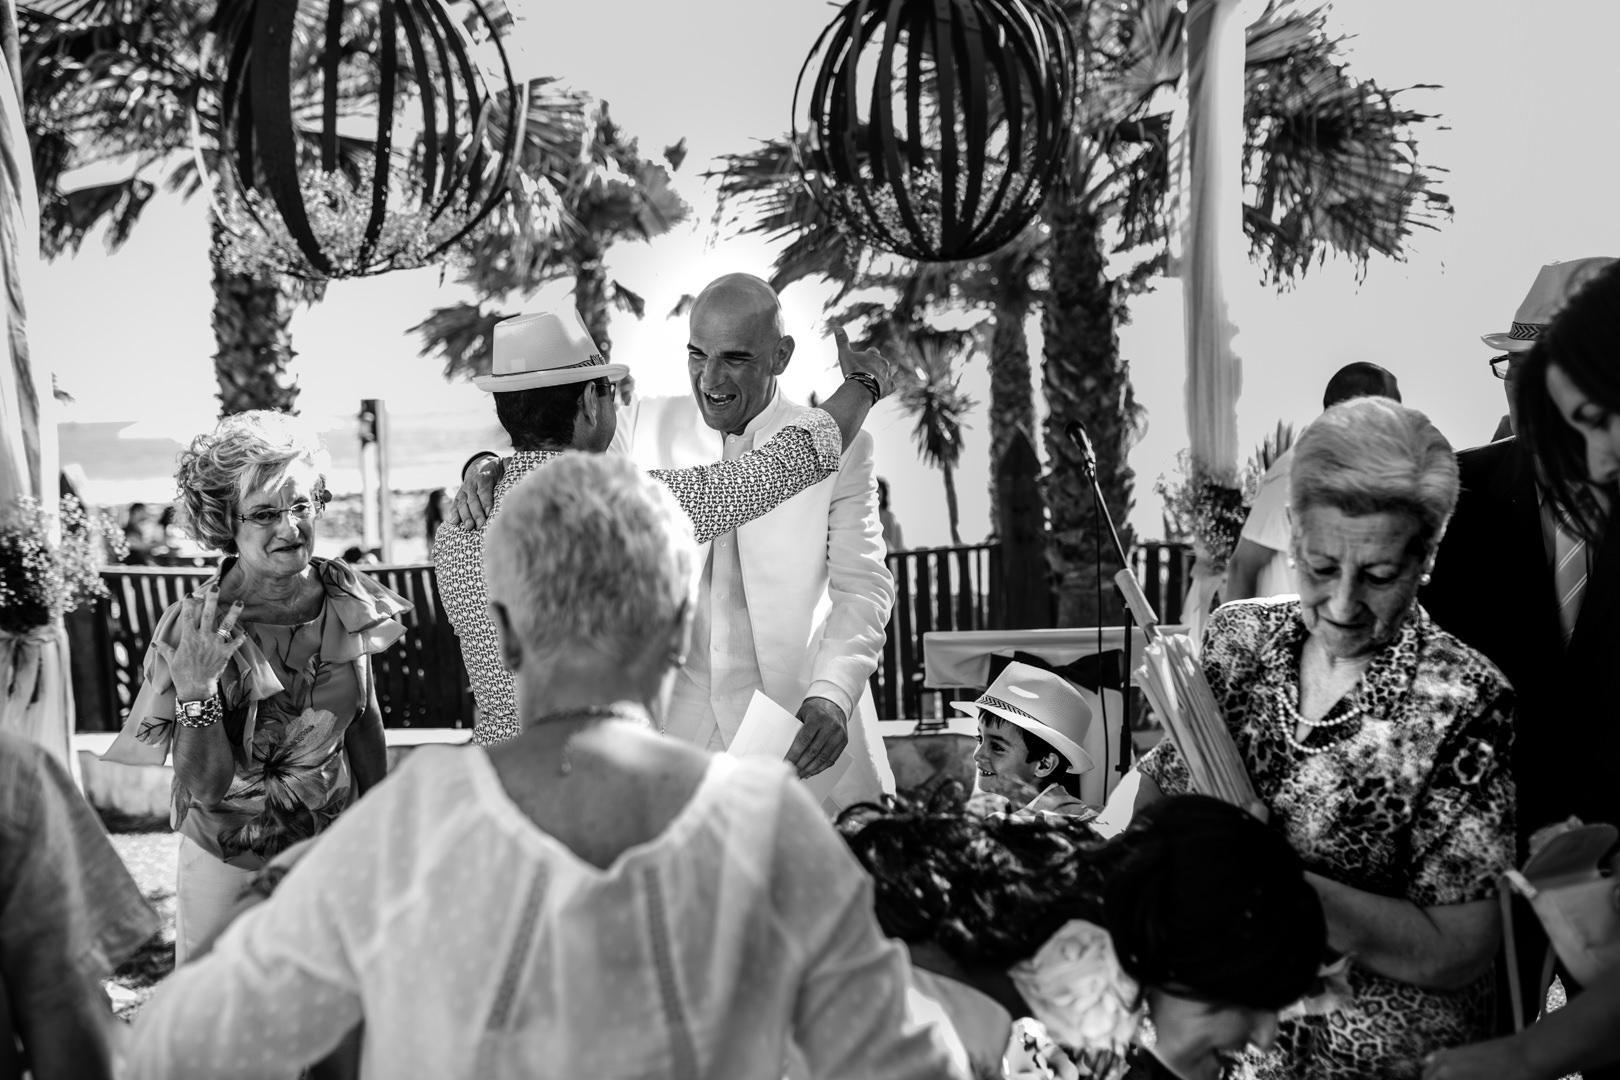 Boda-Sajorami-Beach-Cadiz-Zahora-Pedro-Gema-engagement-Rafael-Torres-fotografo-bodas-sevilla-madrid-barcelona-wedding-photographer--31.jpg